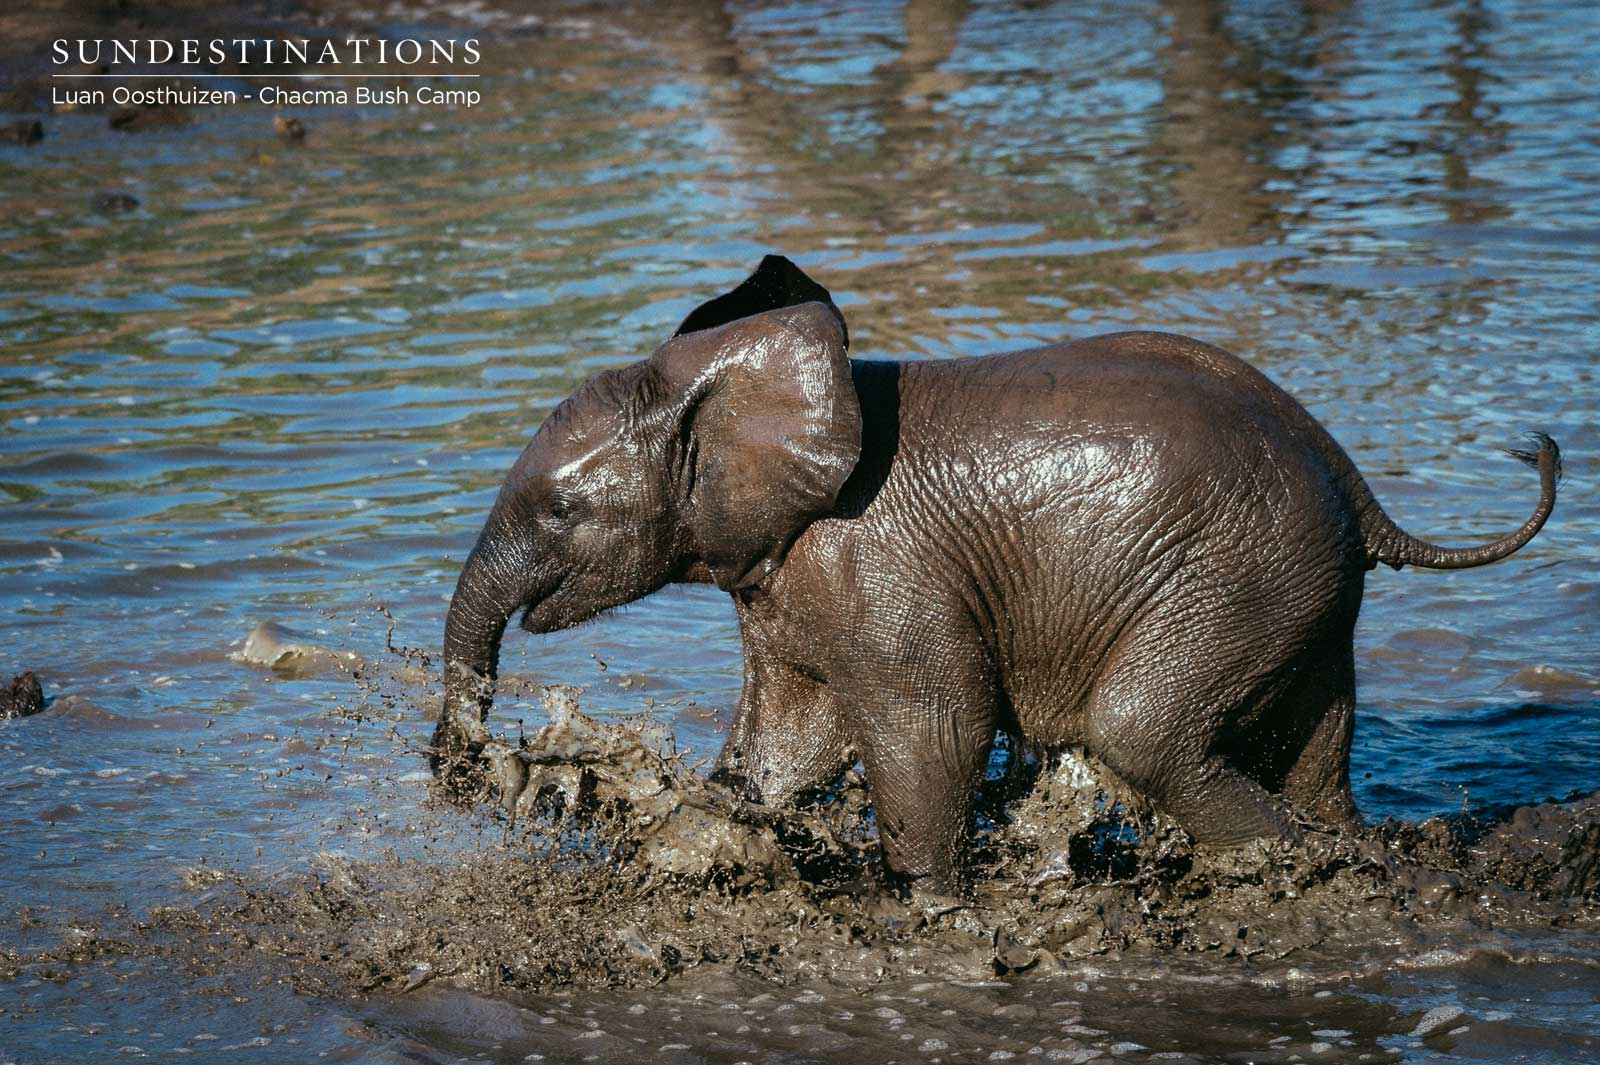 Chacma Elephant Calf